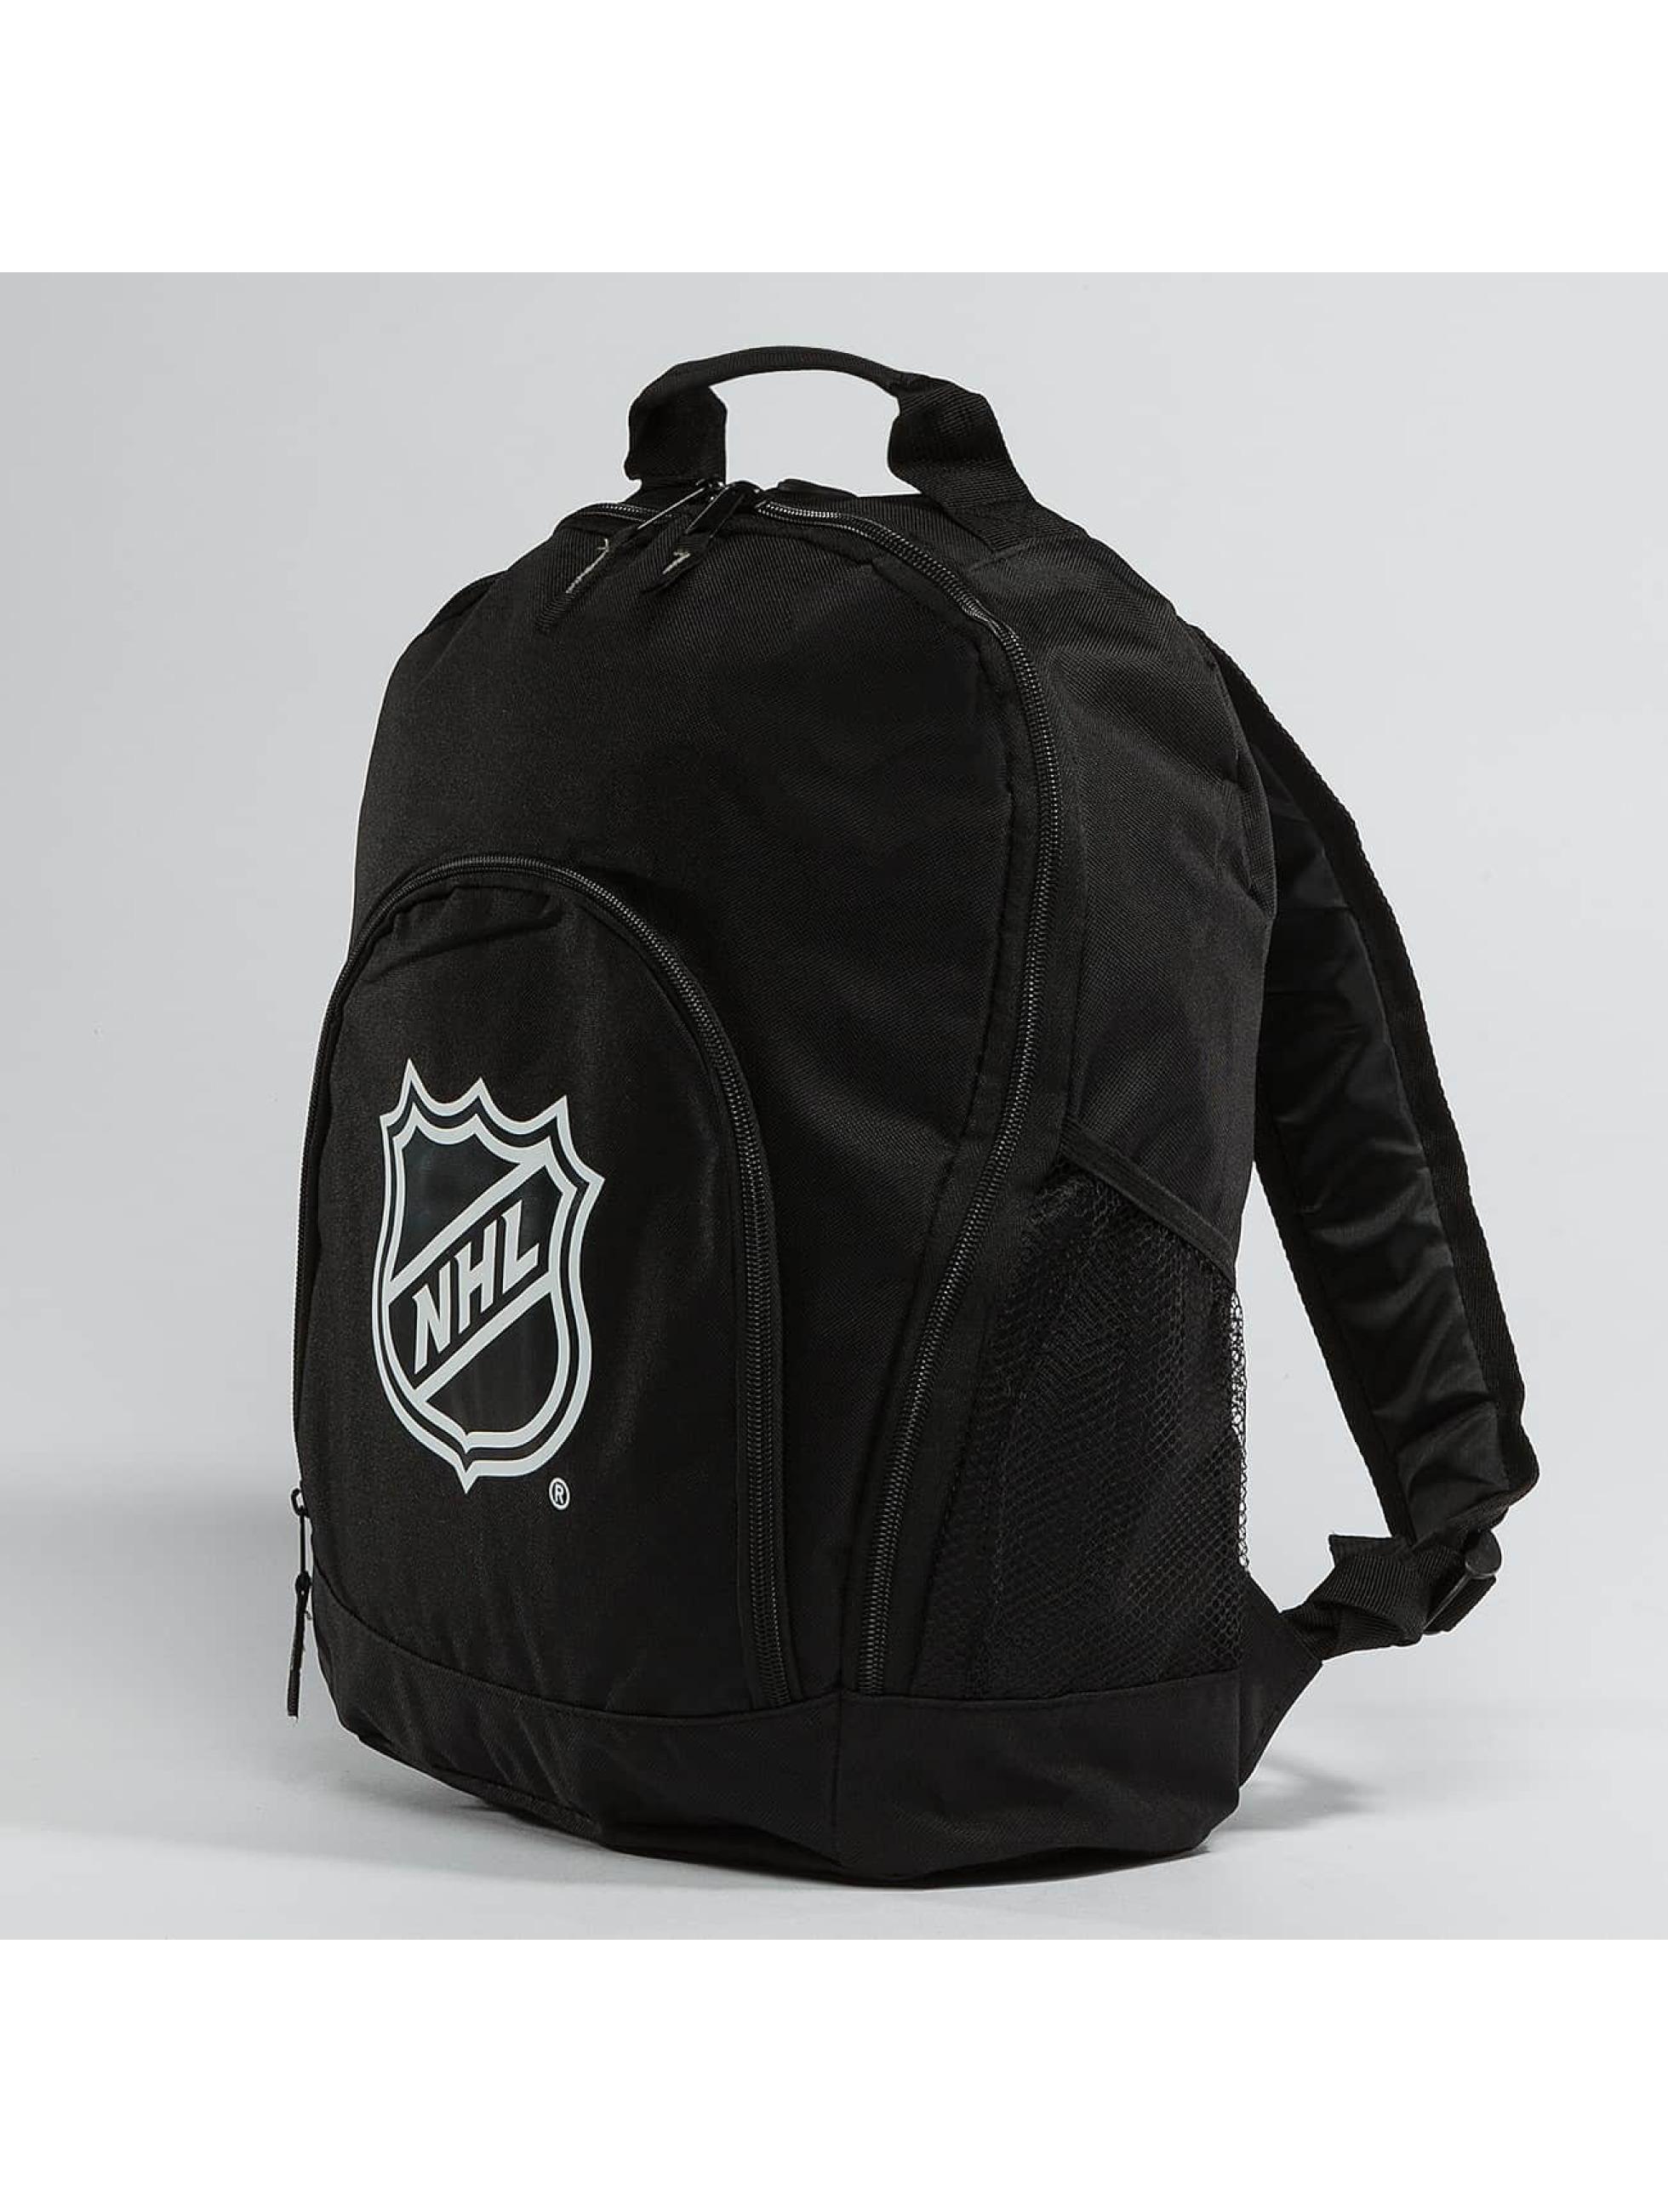 Forever Collectibles rugzak NHL Logo zwart